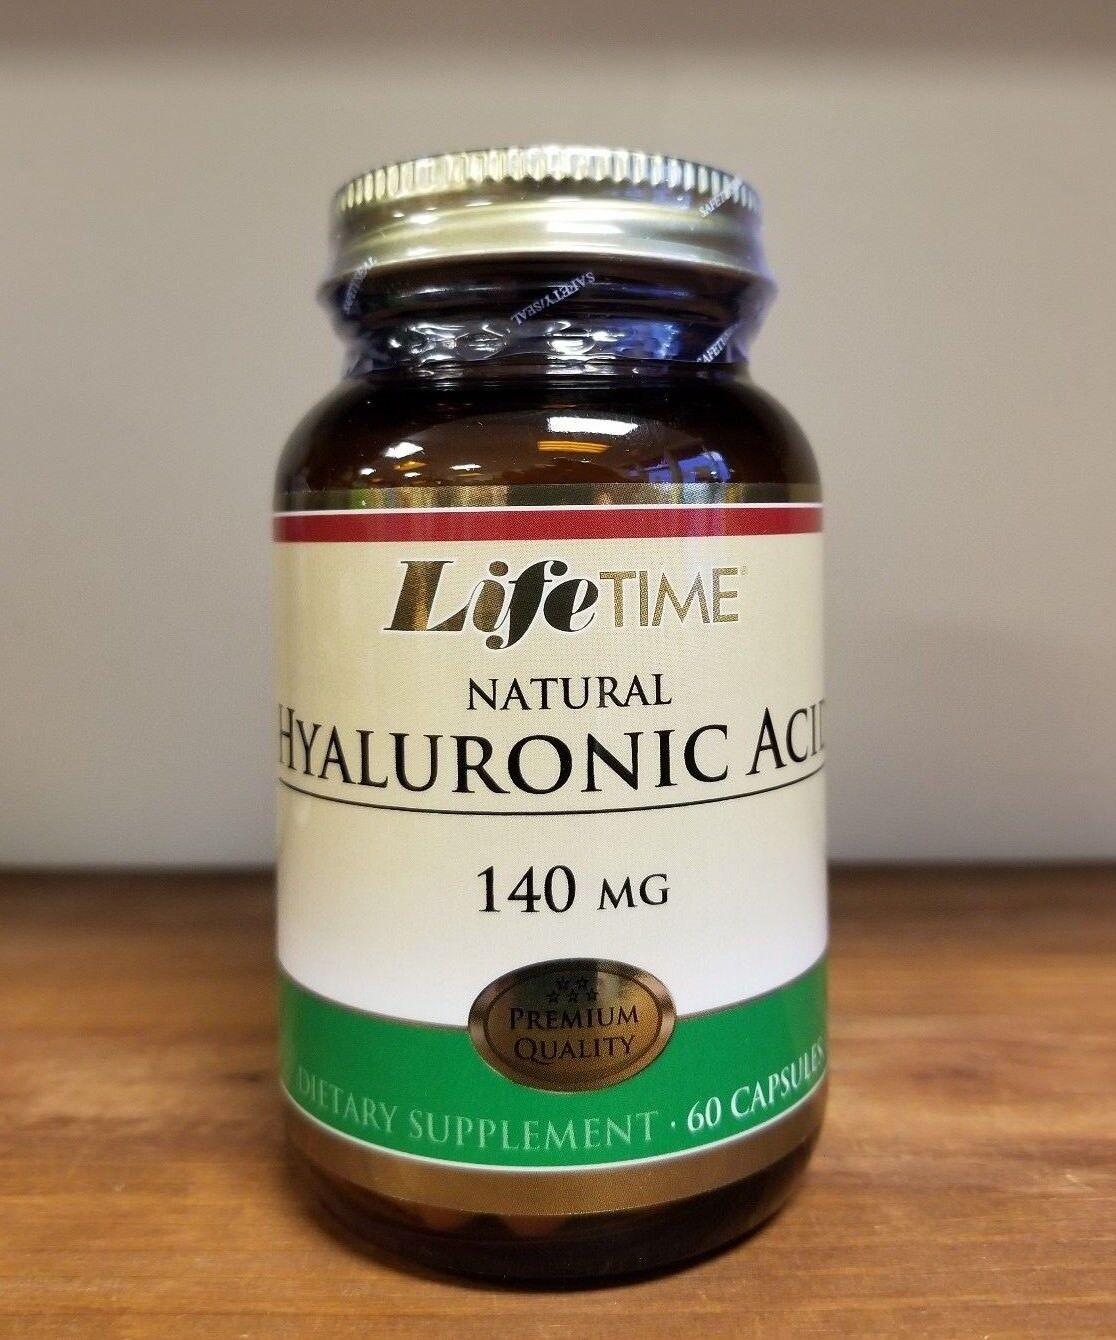 LifeTime Hyaluronic Acid 140 mg 60 Capsules